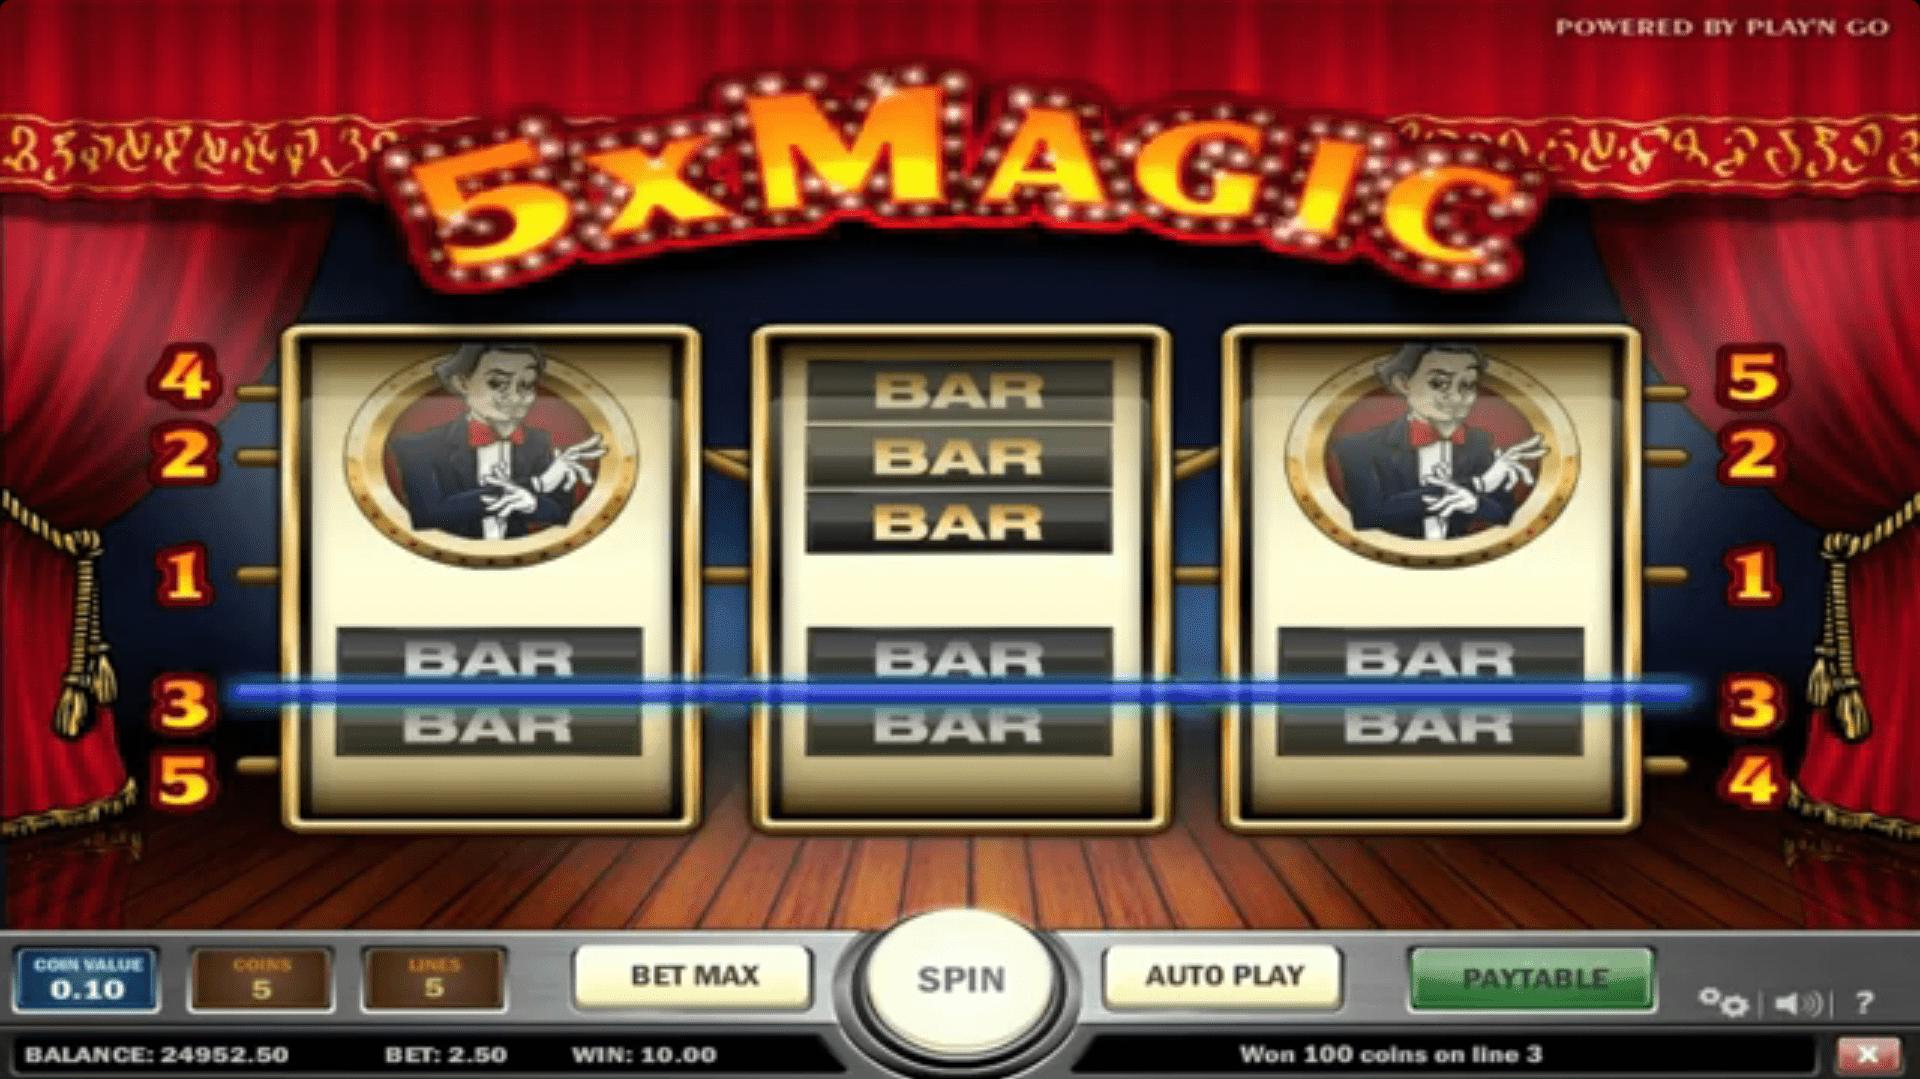 5x Magic Slots Winning